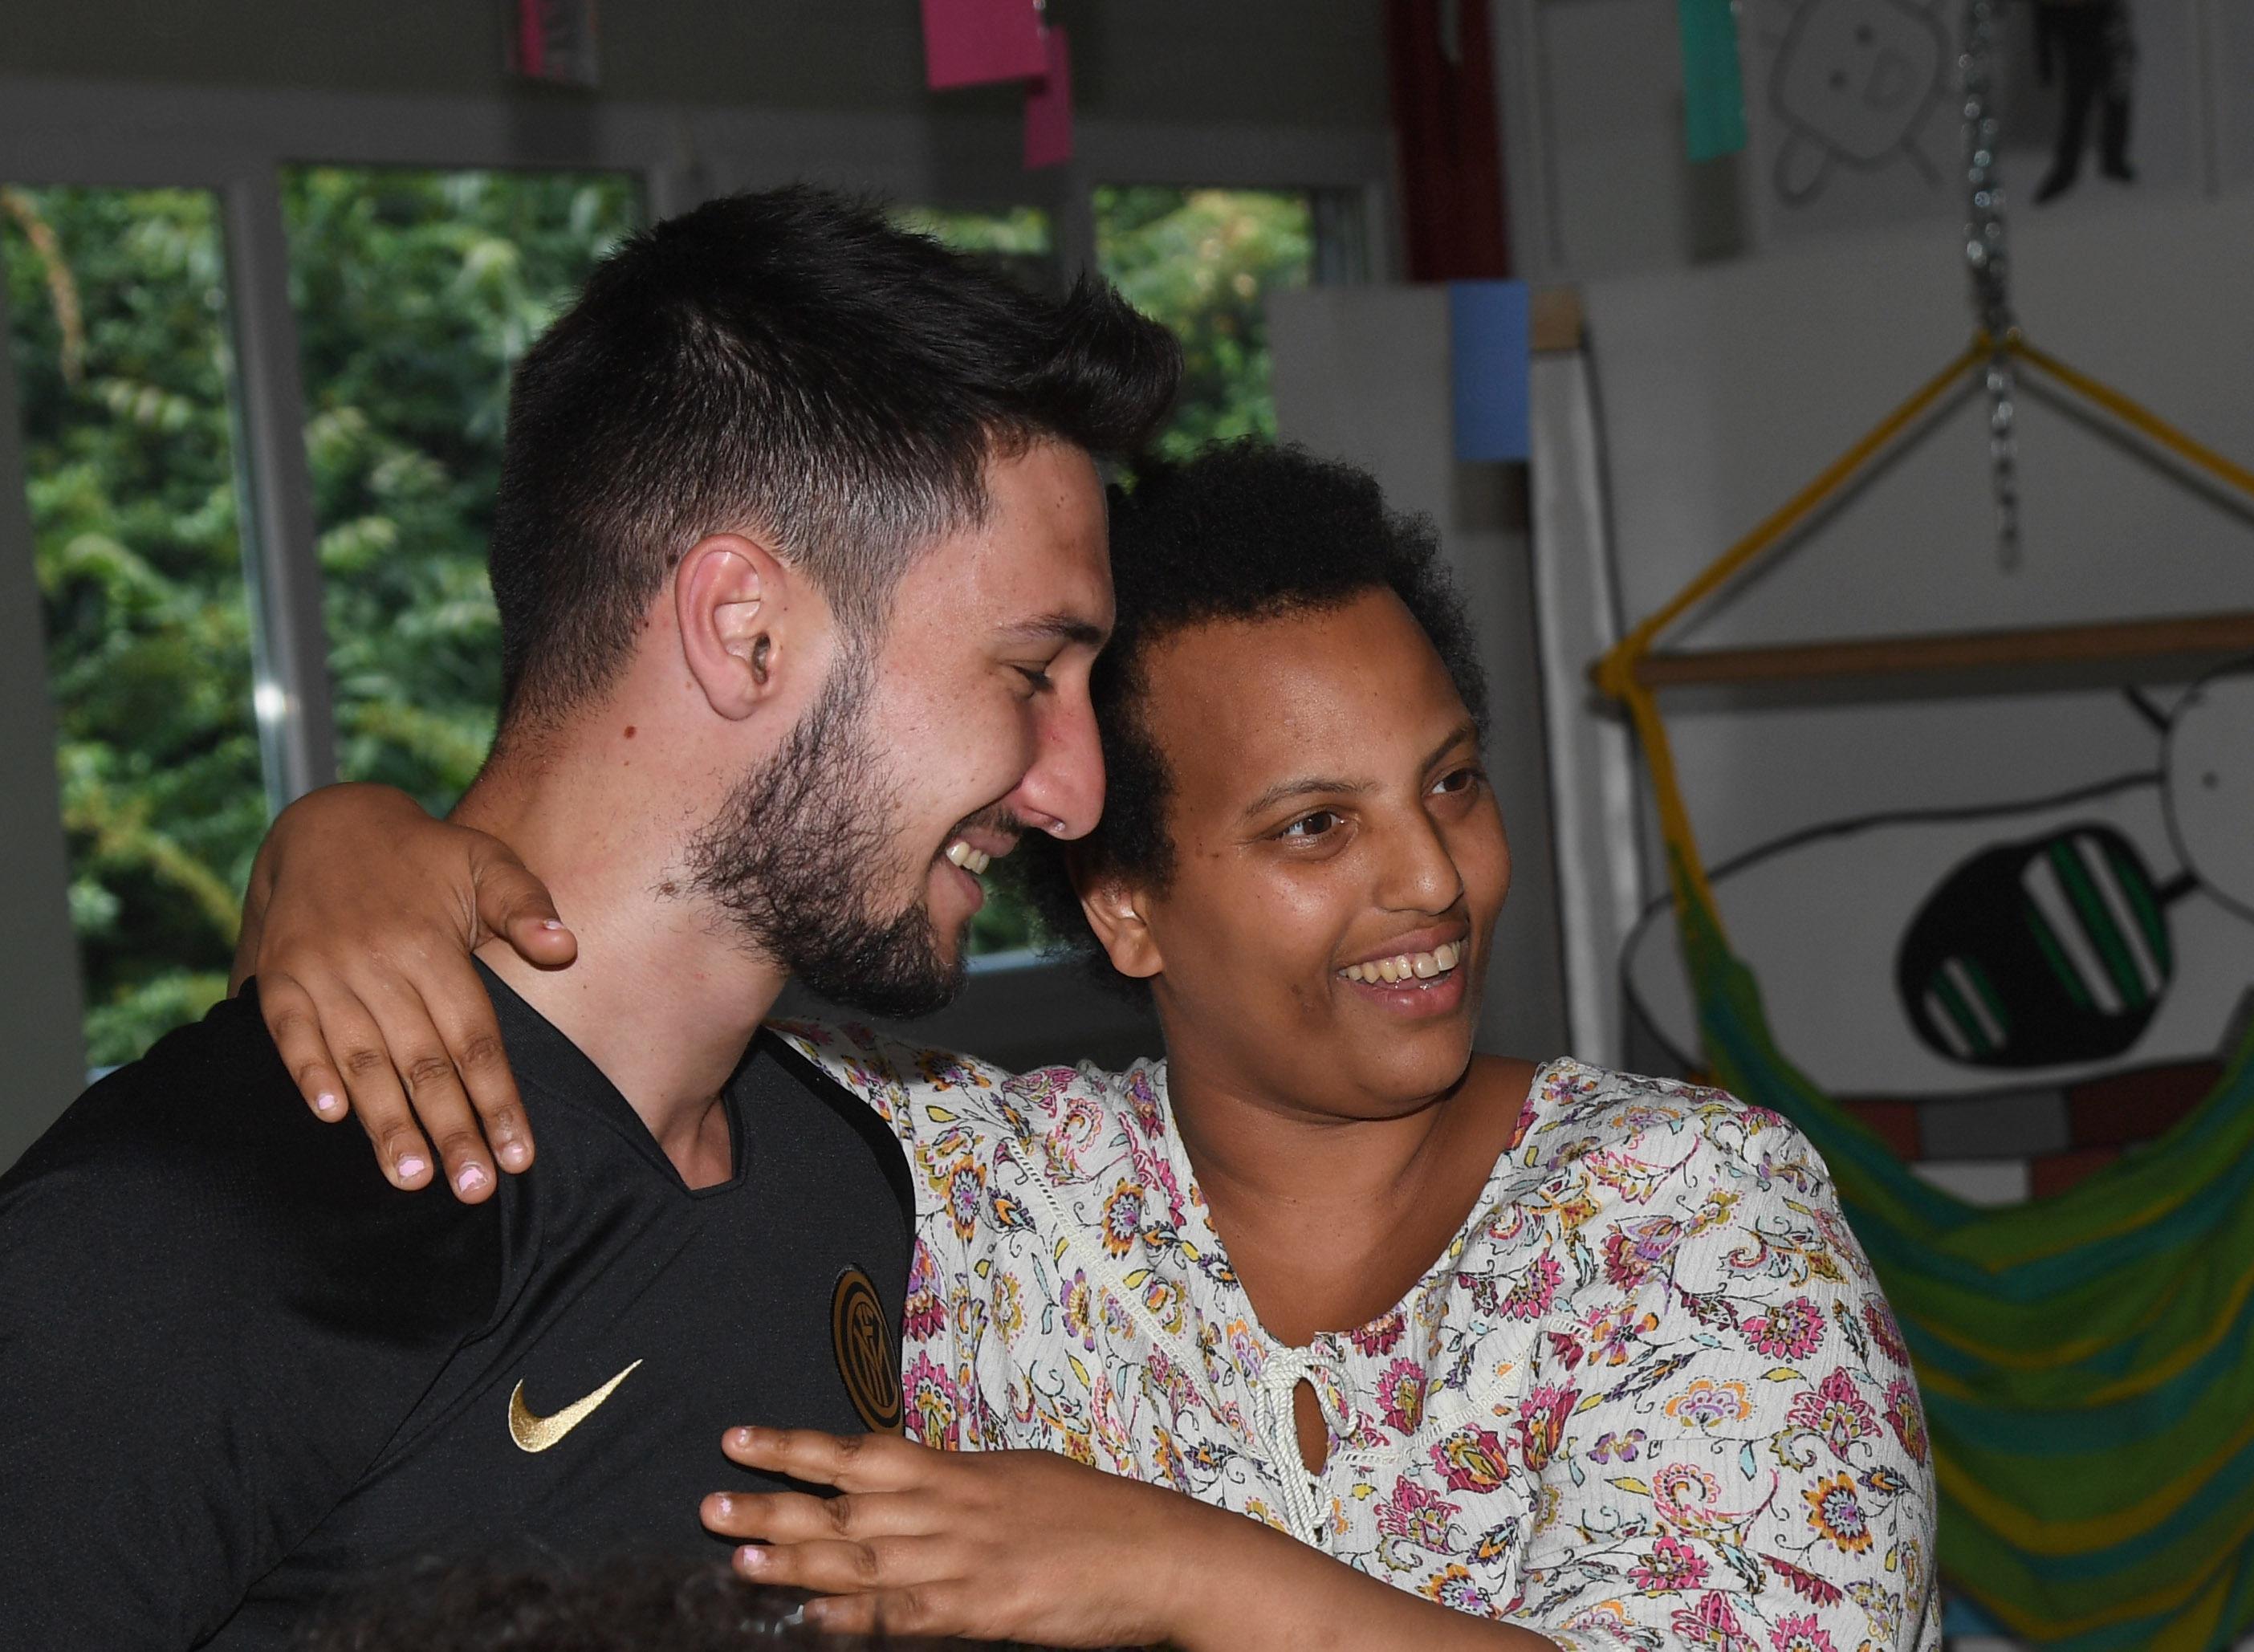 Padelli and Politano visit the OTAF in Sorengo